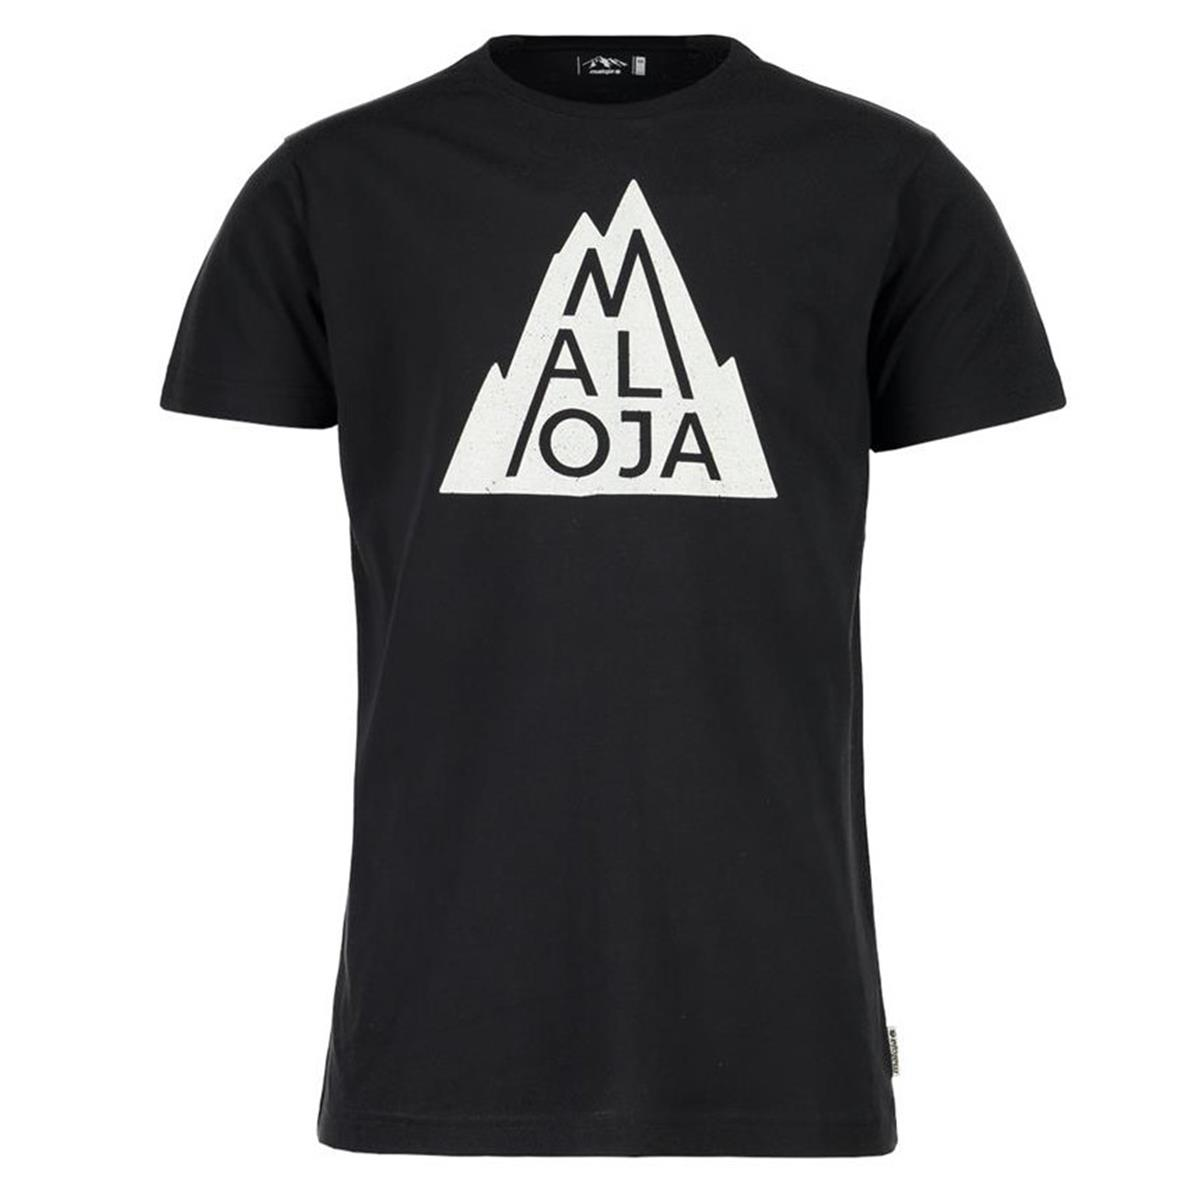 Maloja T-Shirt ChristiamM. Moonless